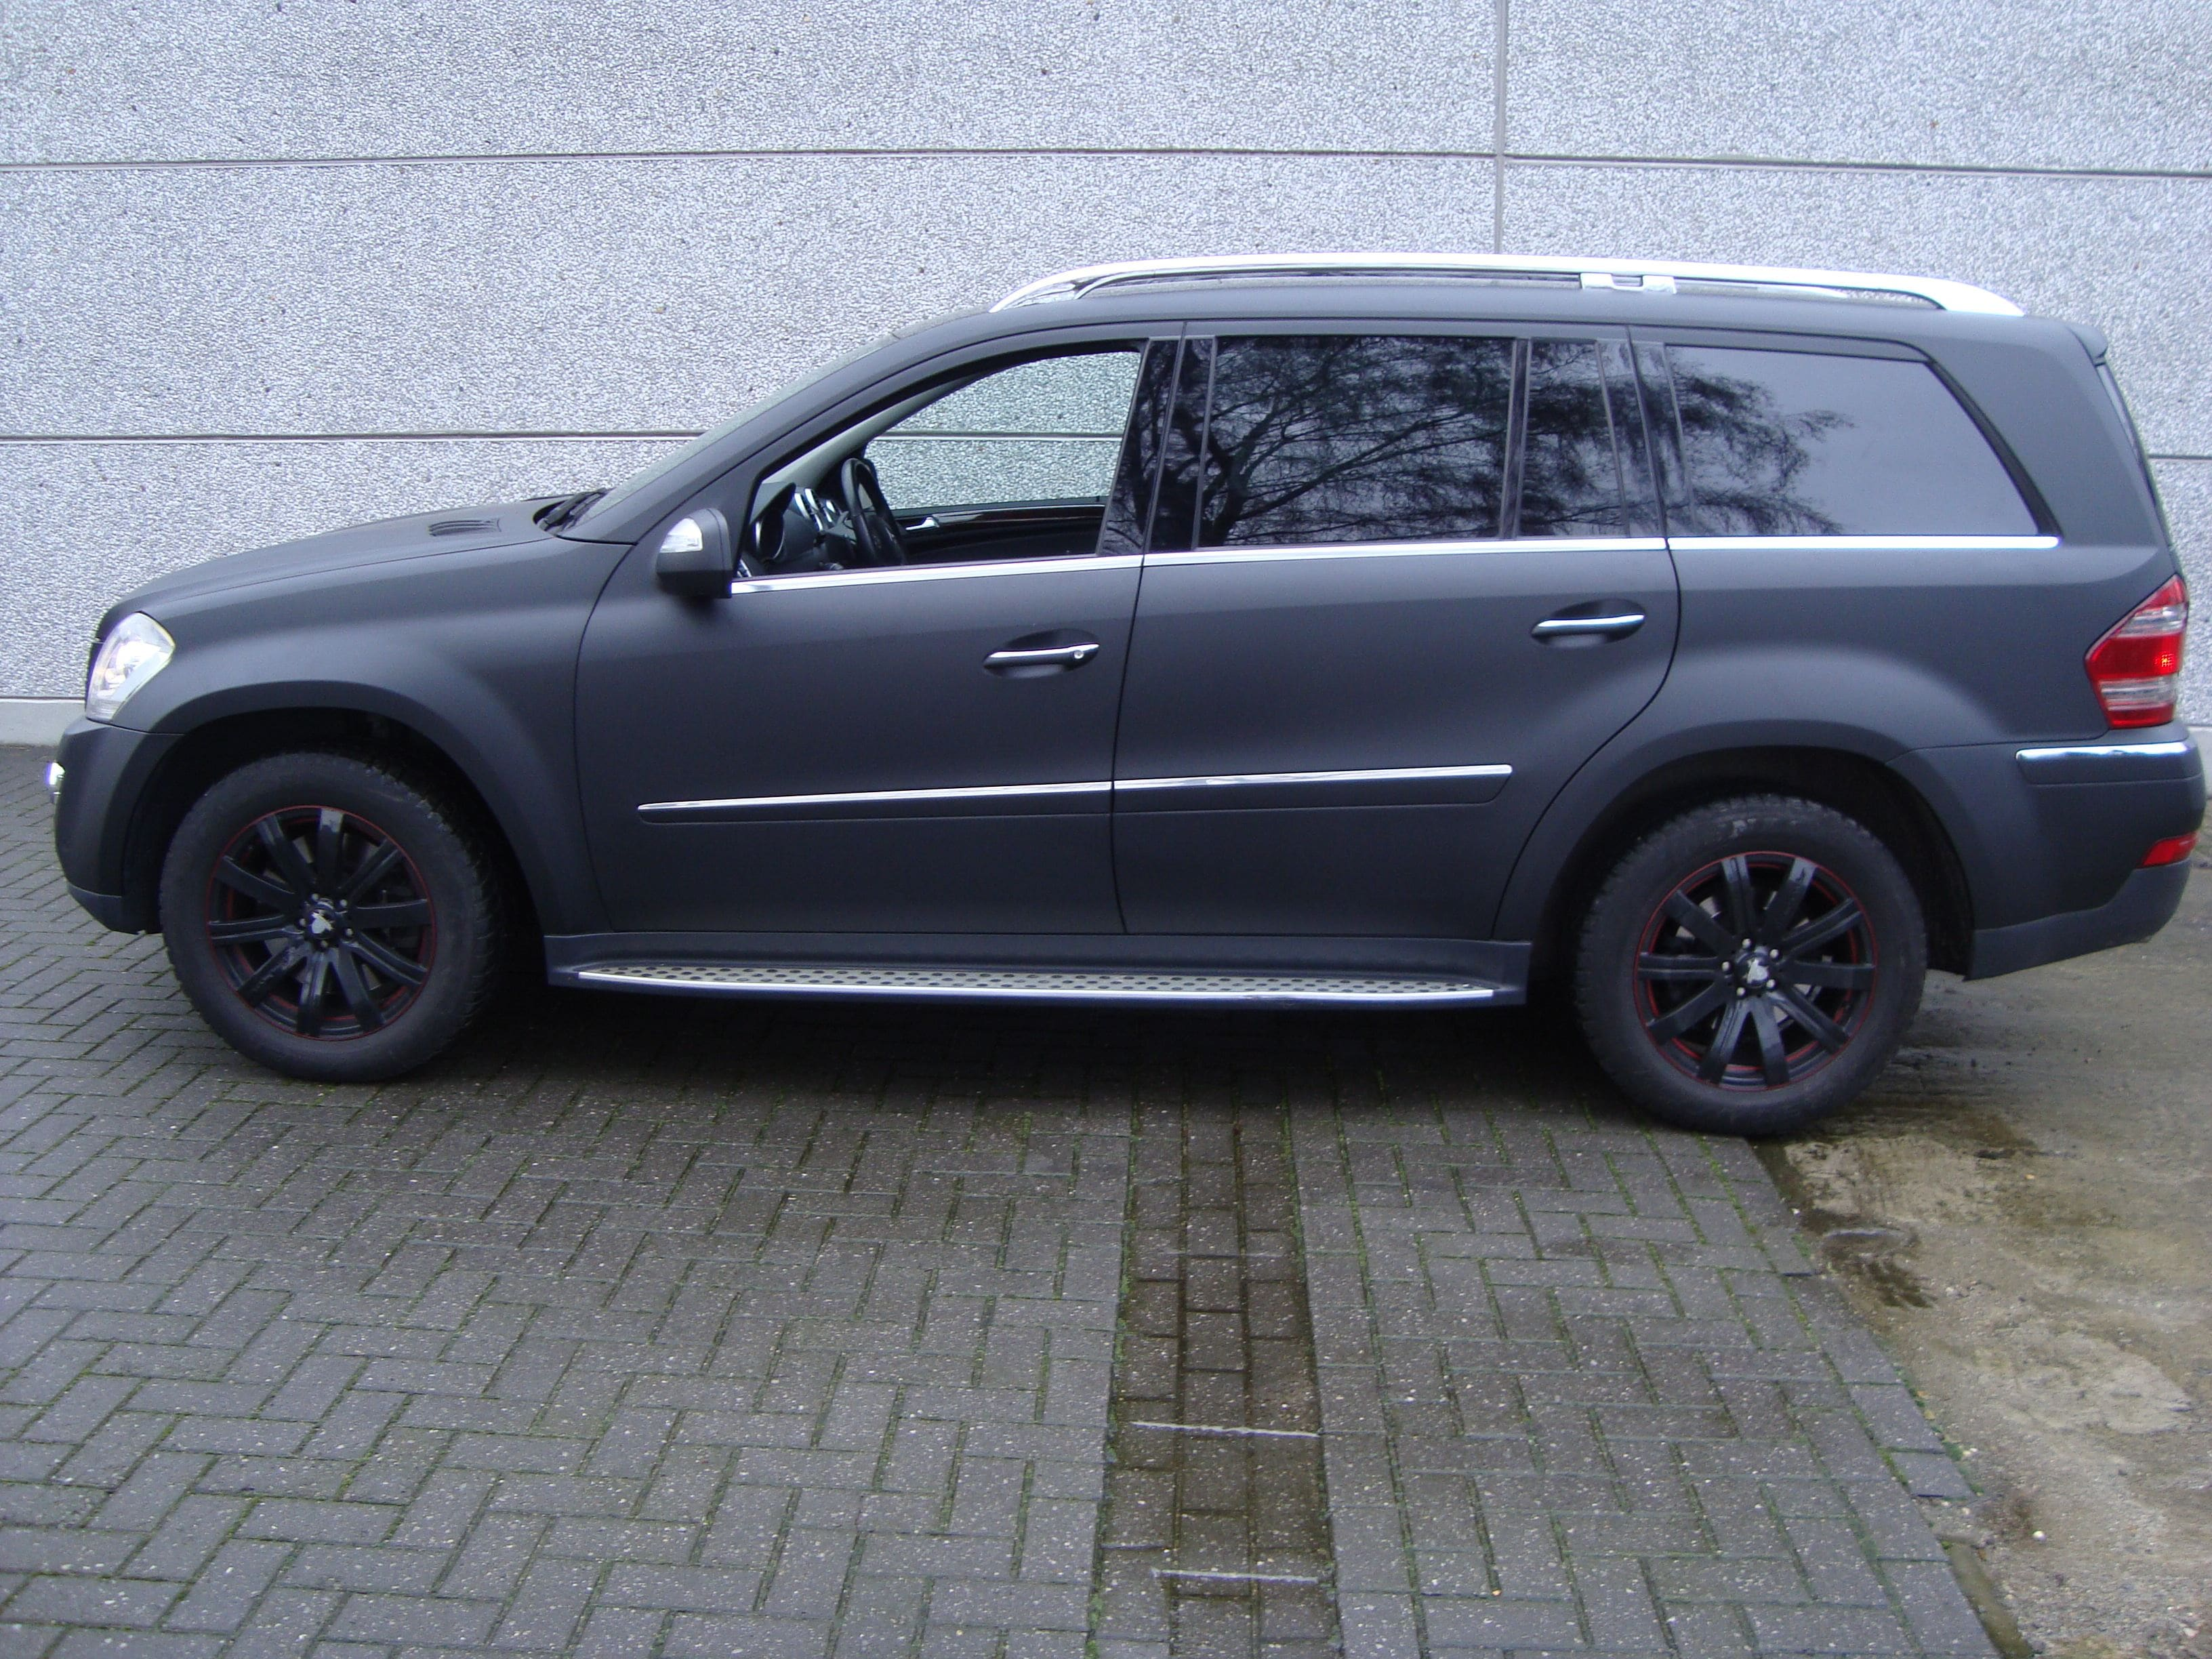 Mercedes GL met Mat Zwarte Wrap, Carwrapping door Wrapmyride.nu Foto-nr:6282, ©2020